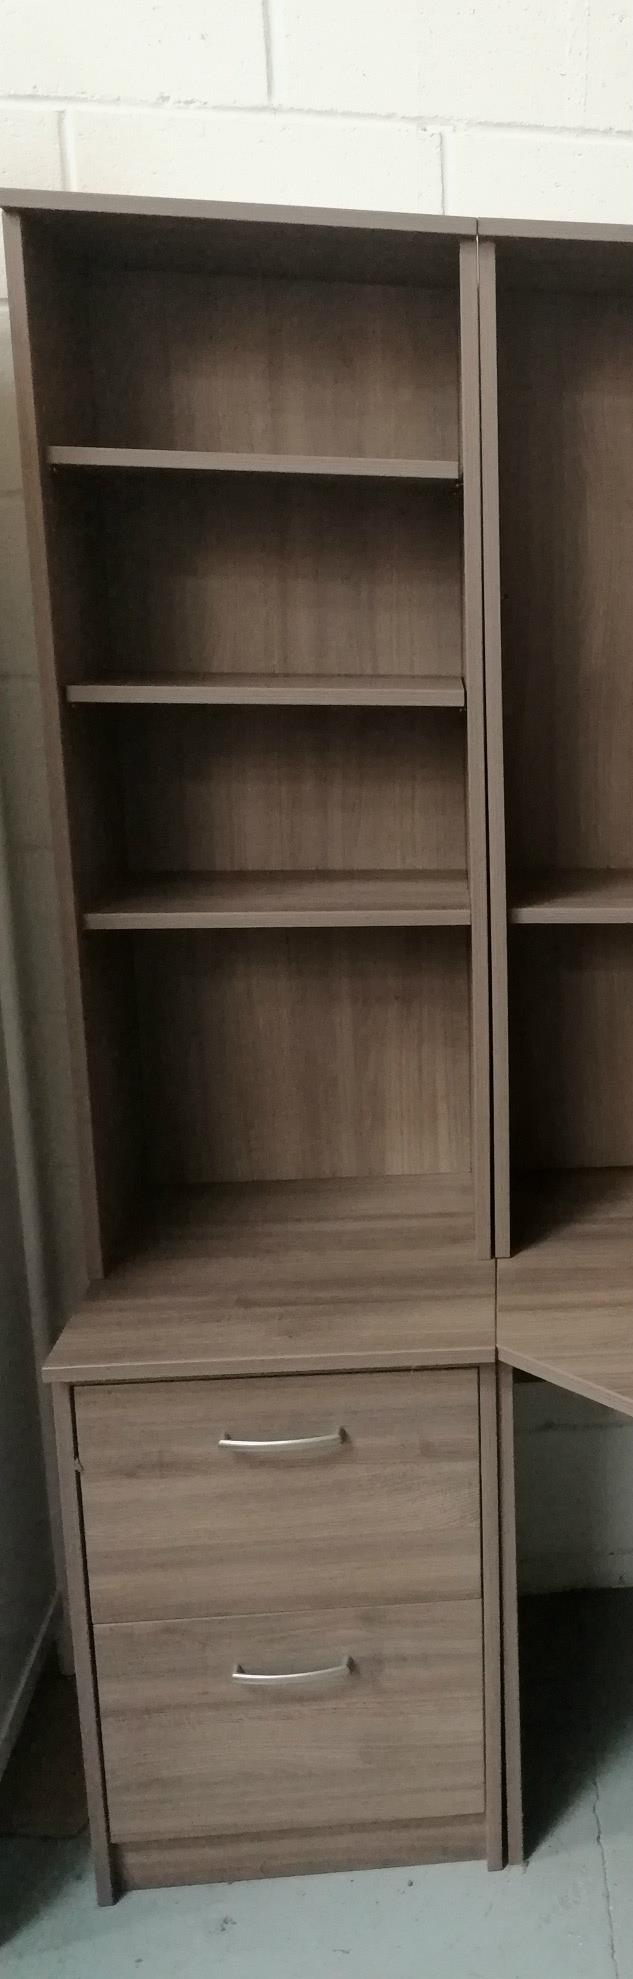 Corndell - PURE OFFICE - Tall Narrow Top Bookcase - Plum